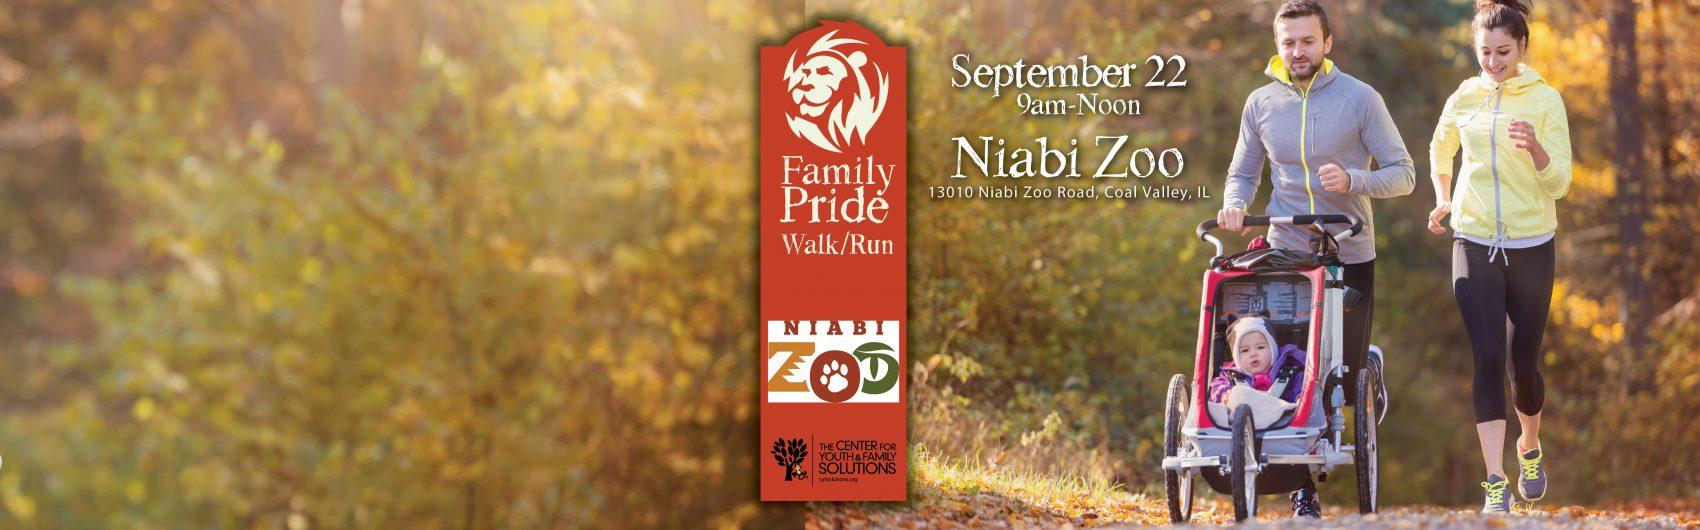 Join the Family Pride 2.5K Walk/Run!